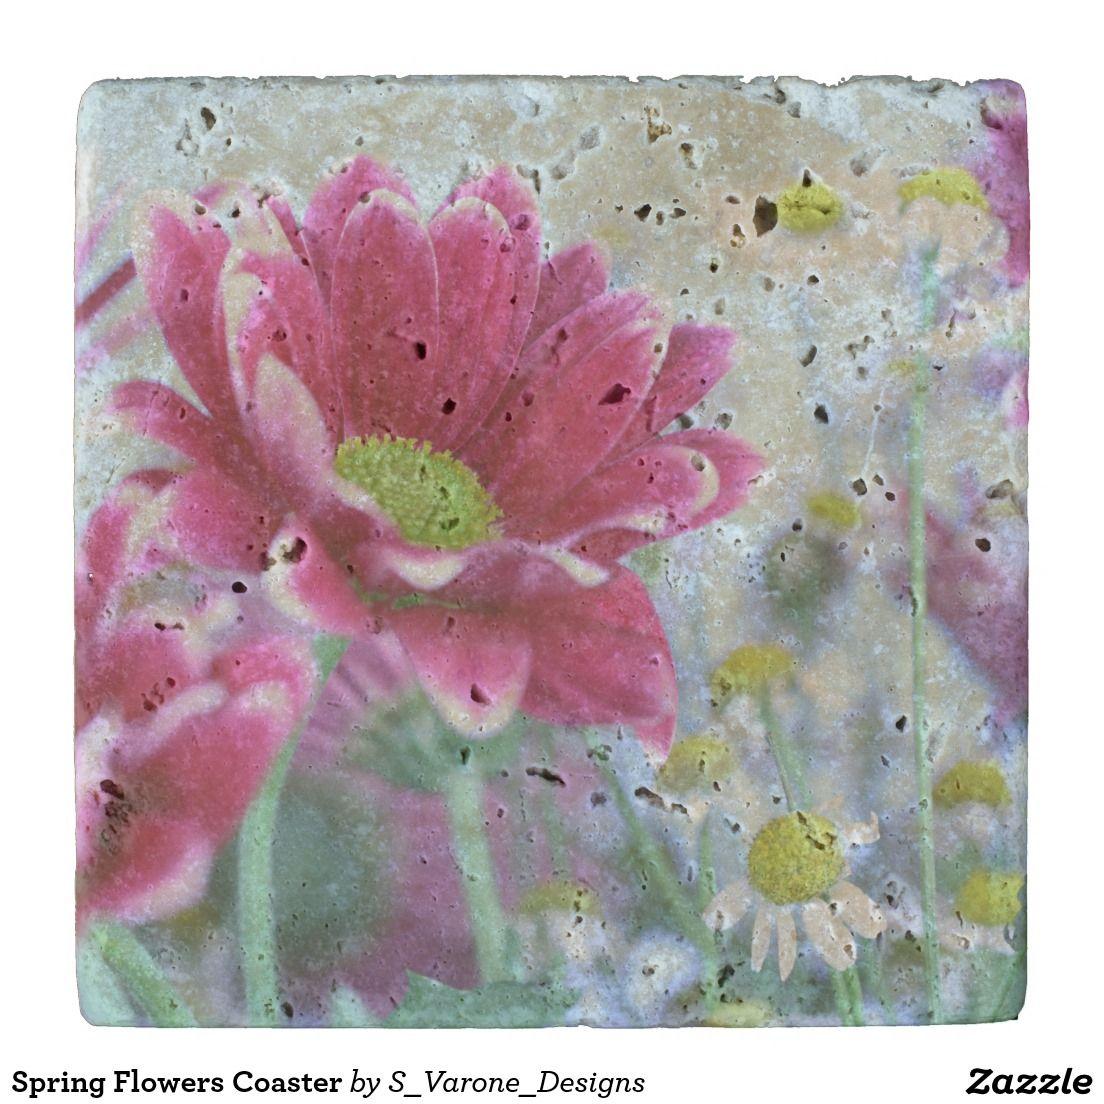 Spring Flowers Coaster Stone Beverage Coaster #StoneCoaster #DrinkCoaster #Coasters